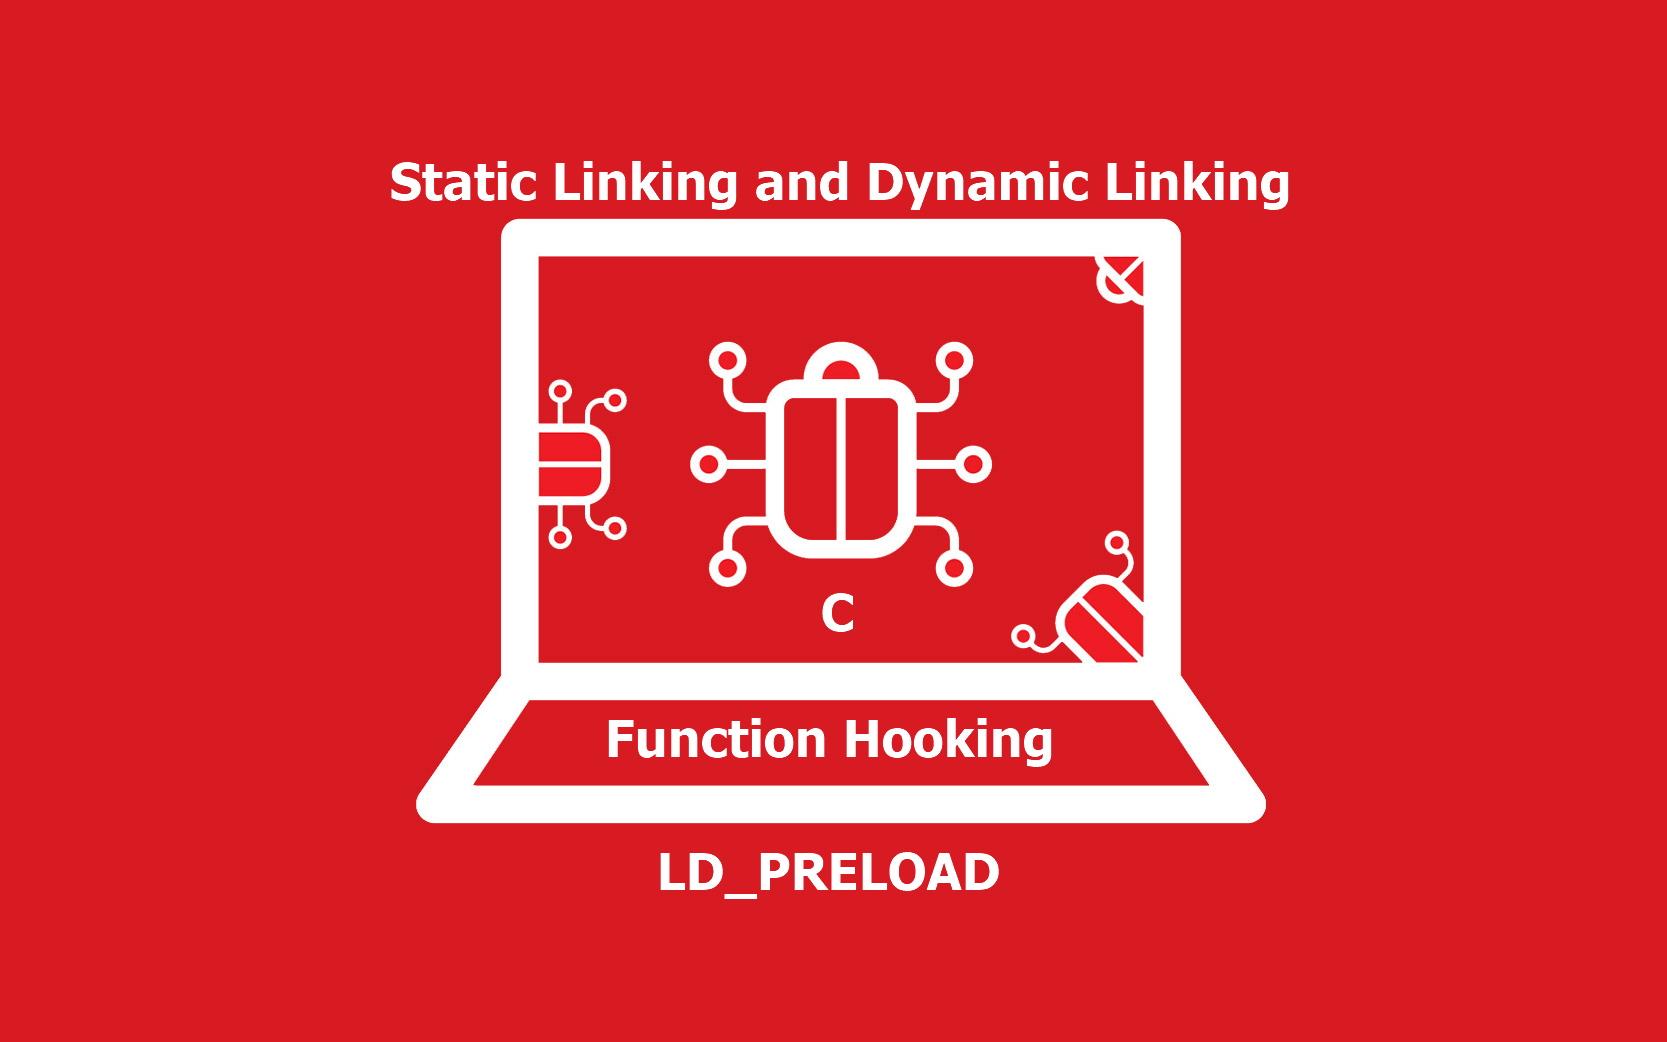 شرح Static Linking و Dynamic Linking و Function Hooking في C